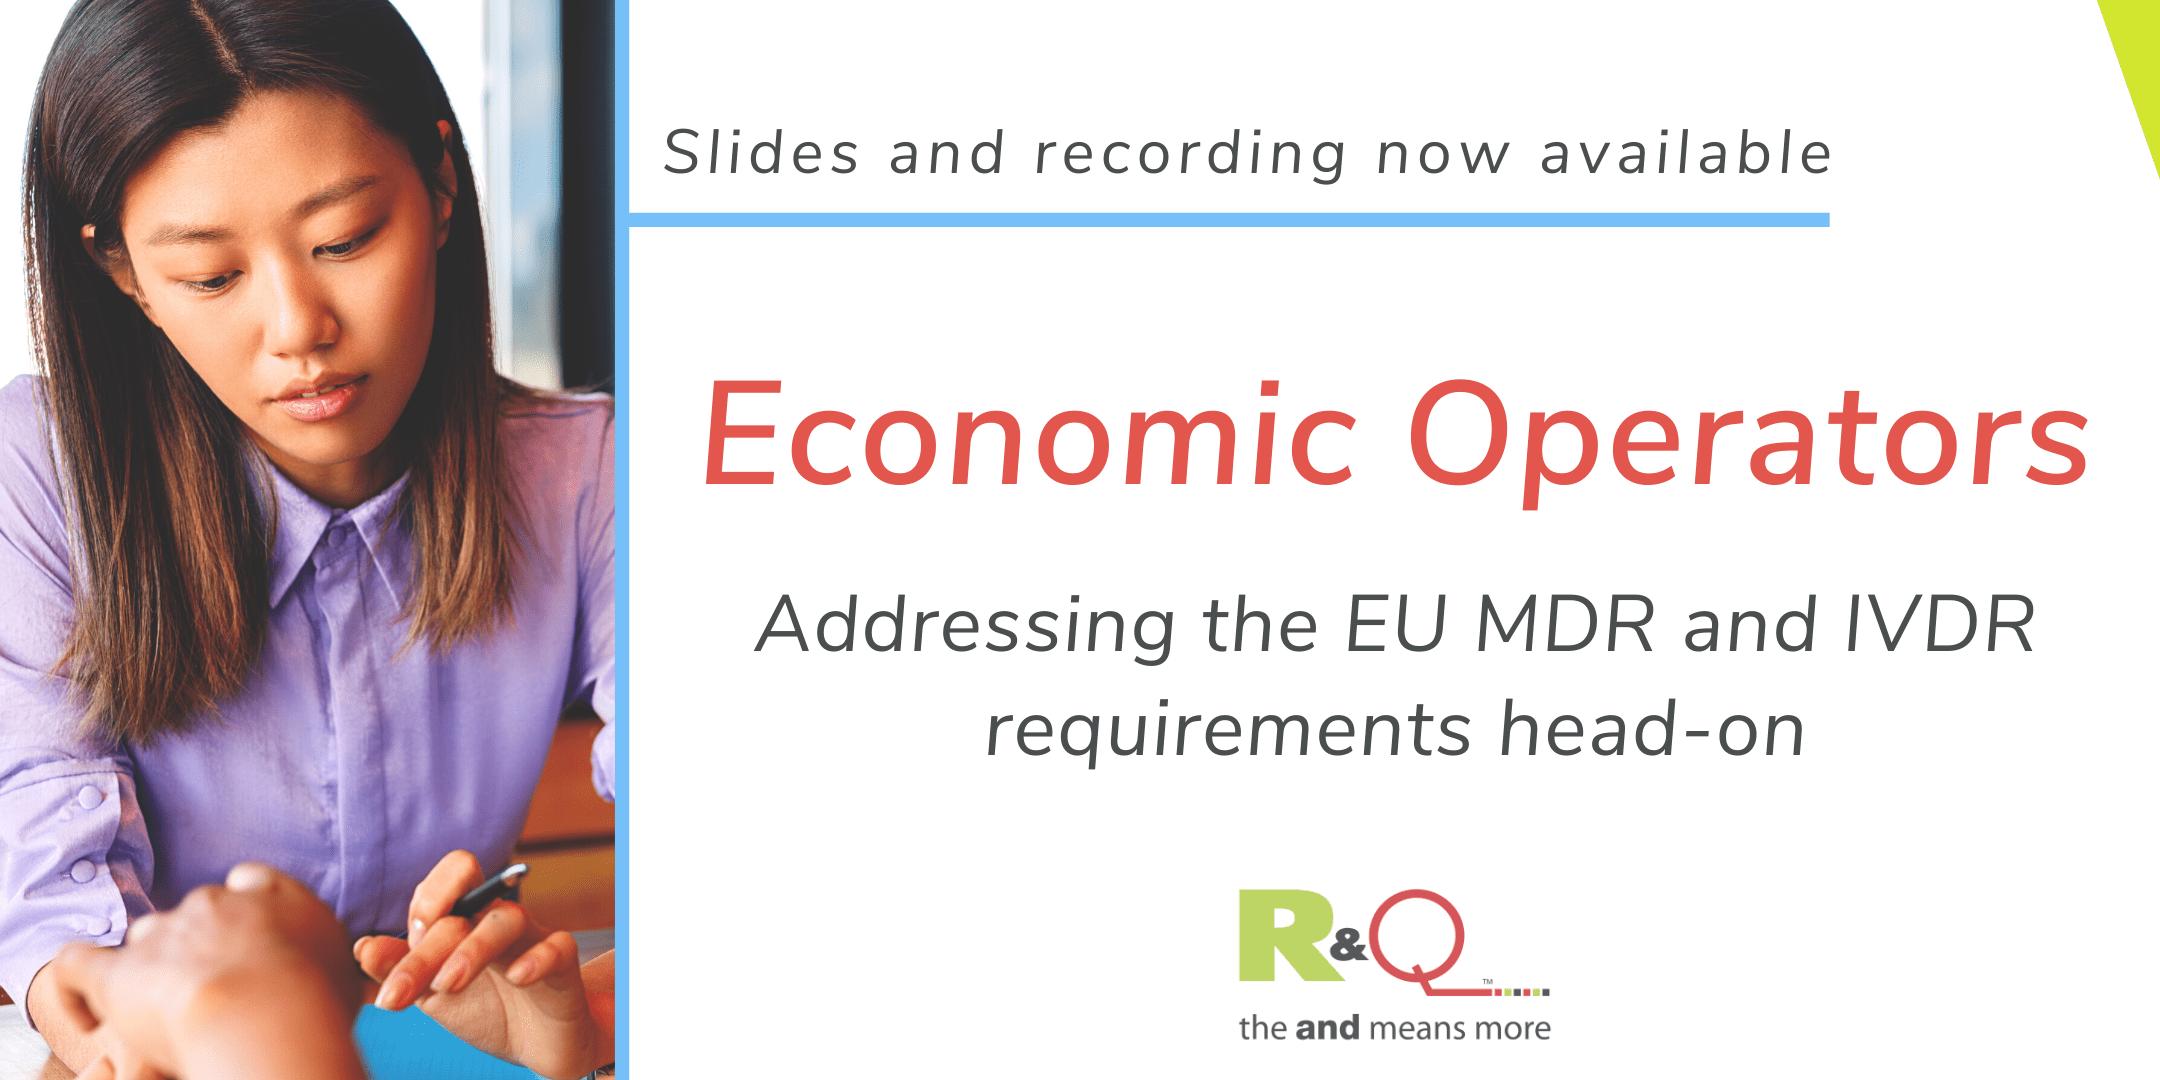 RQ_WB_Economic_Operators_EU_MDR_IVDR_Slides_Available_Promo-min